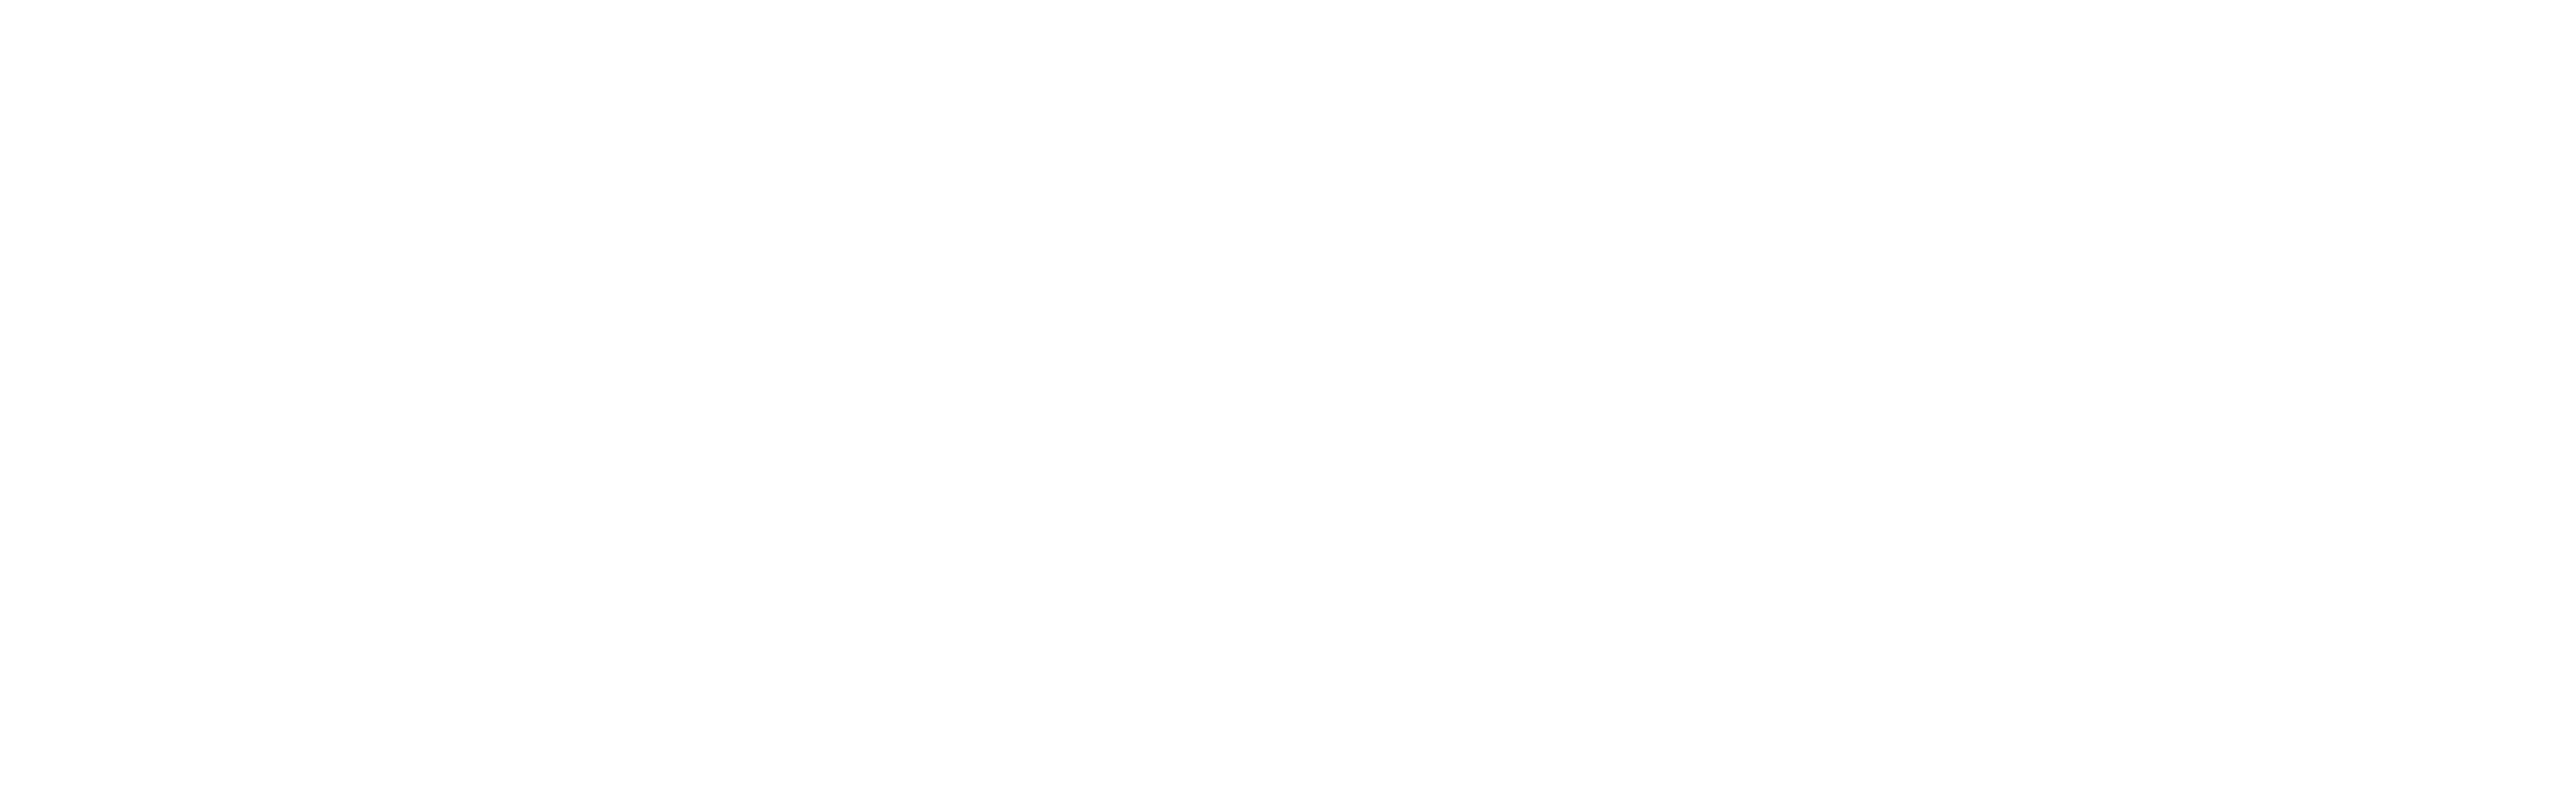 Promote - Die integrierte Lerntransfer-Plattform